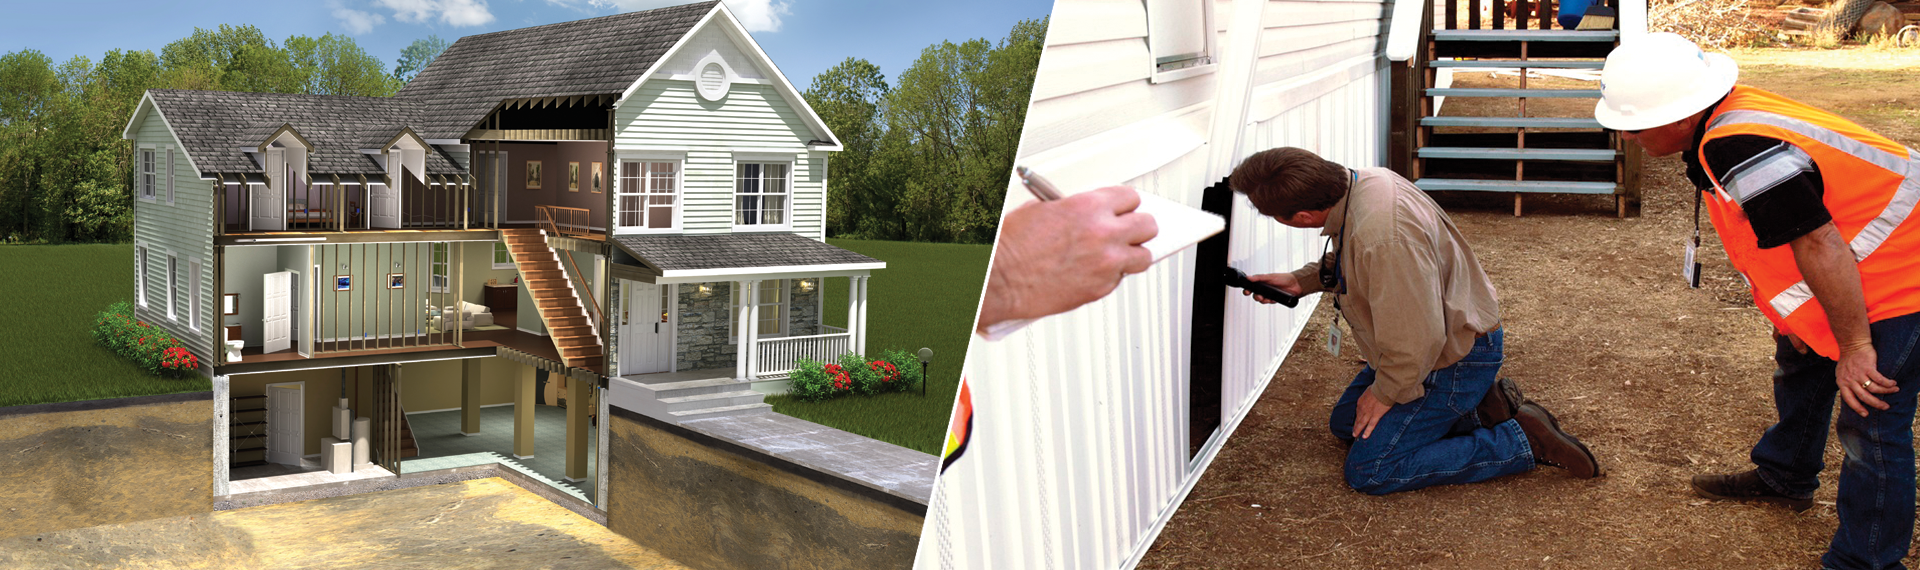 Pillar To Post Home Inspections Schaumburg IL